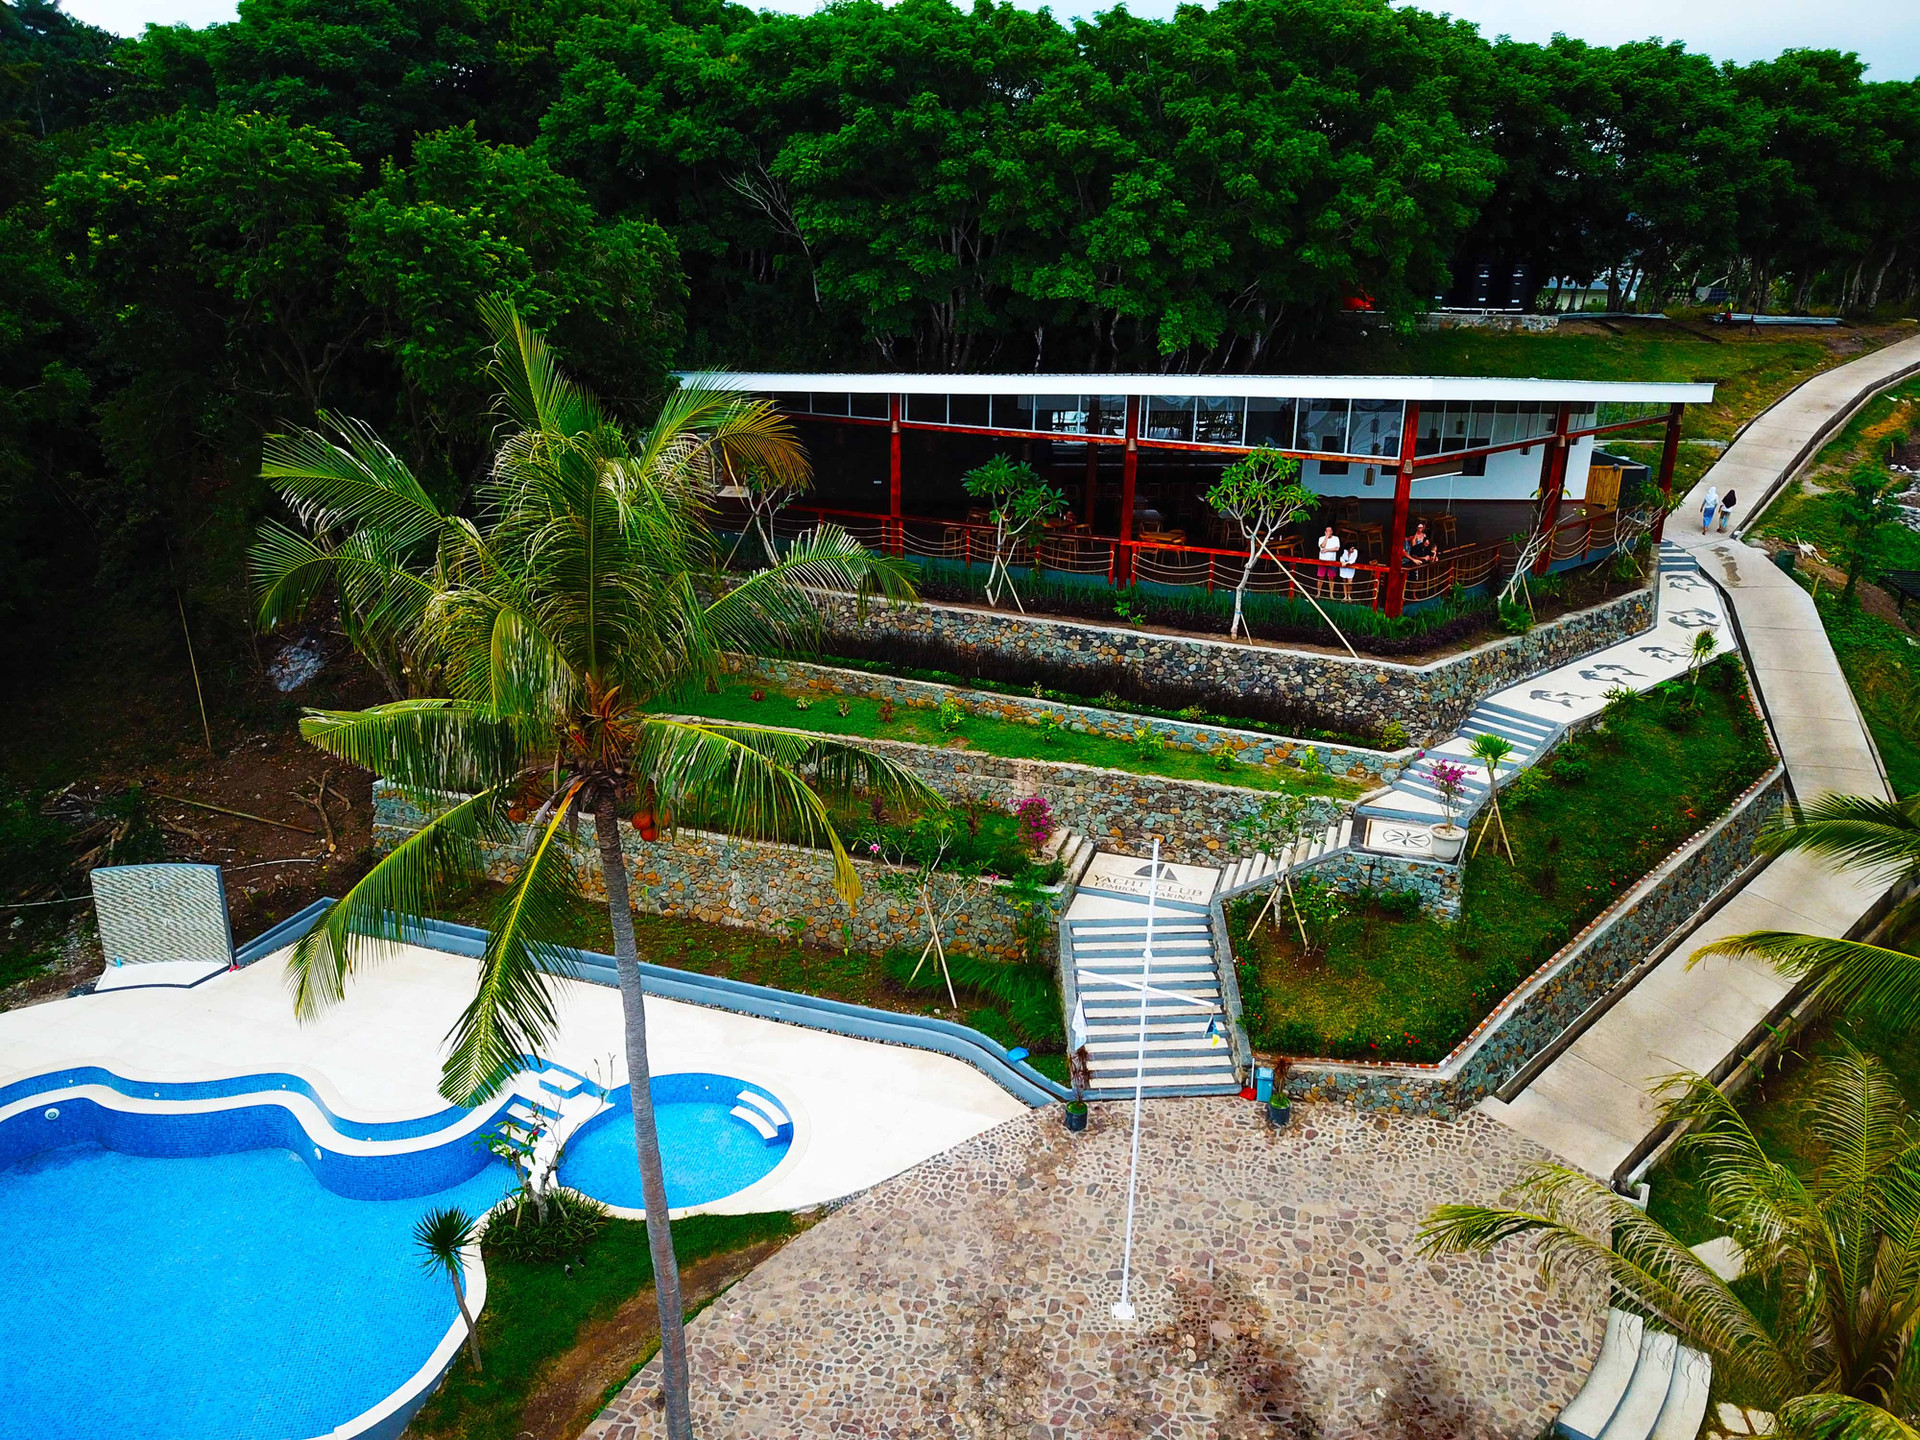 Lombok Marina Del Ray Pool side Bar smal